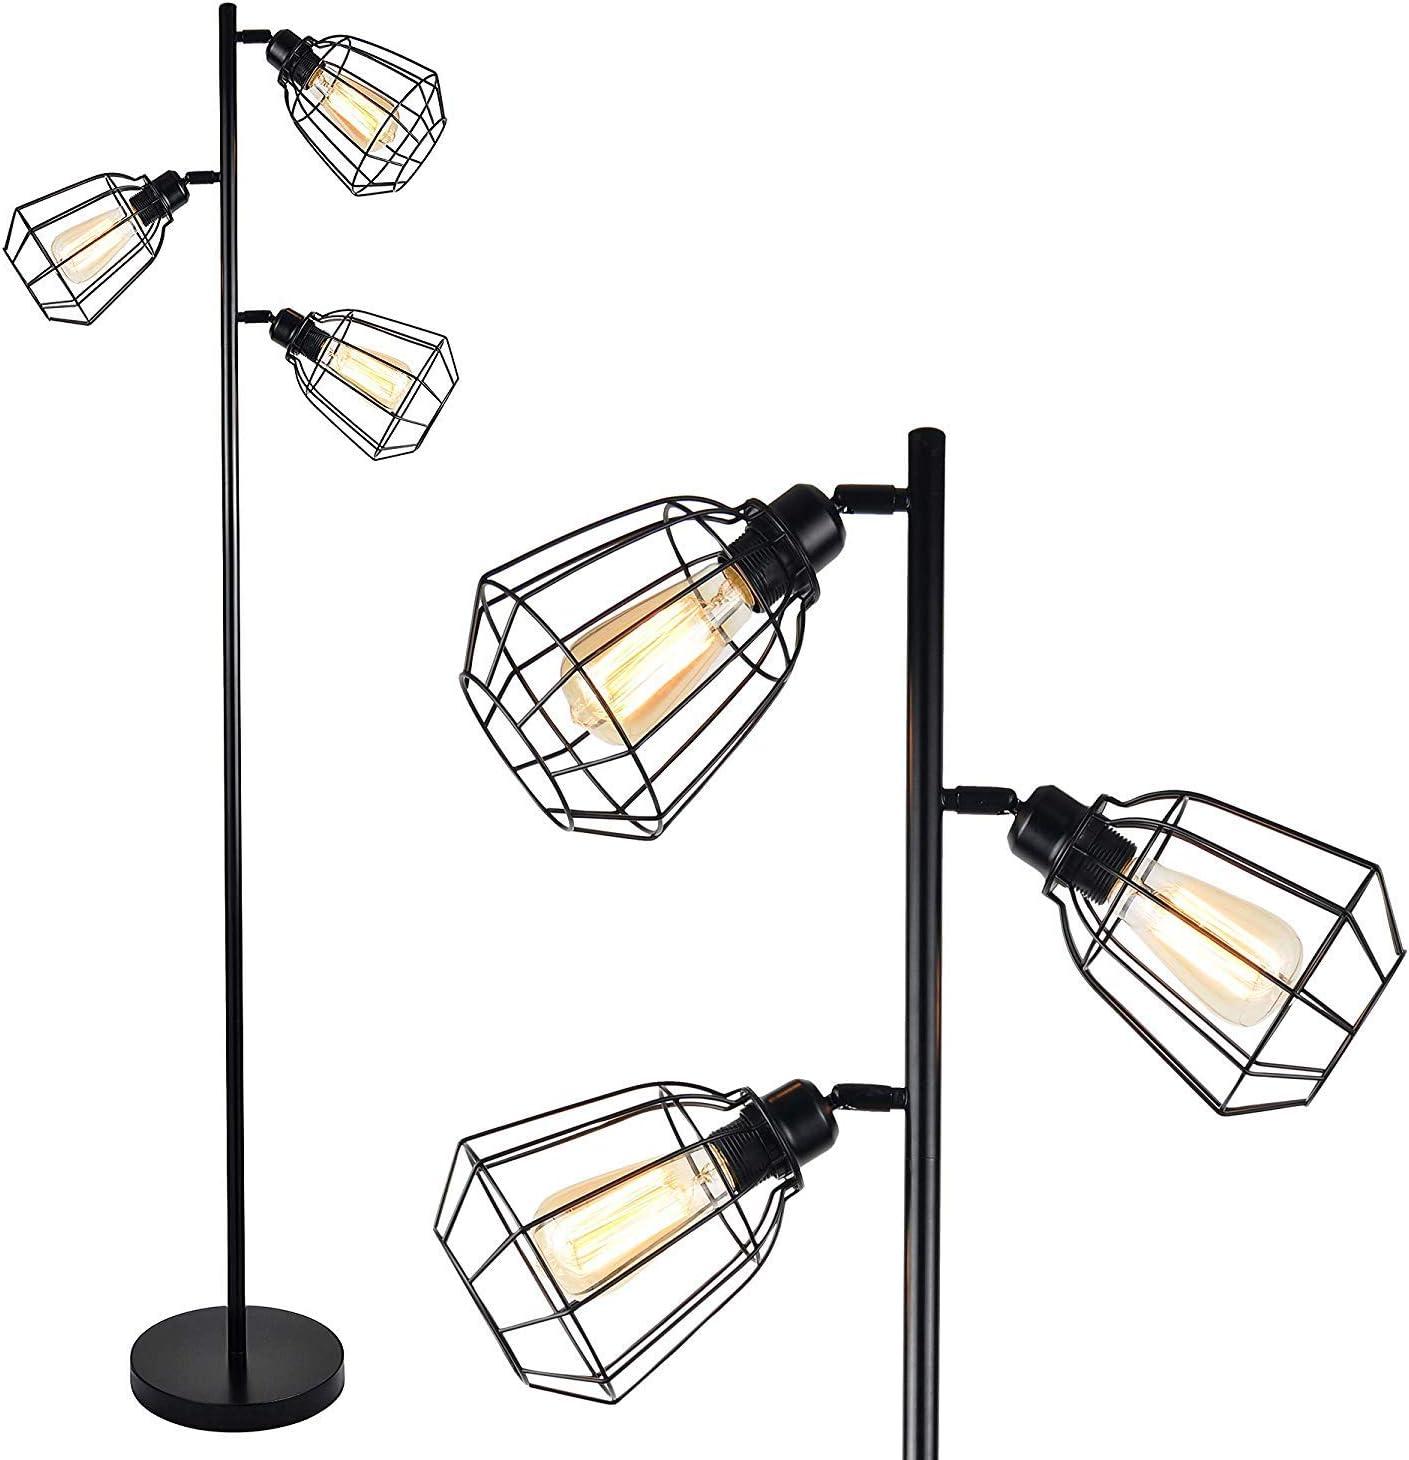 Amazon Com Leonlite 65inch Track Tree Floor Lamp 3 Bulbs Included Industrial Floor Lamps Rustic 3 Head Torchiere Lamp Fixture Home Improvement